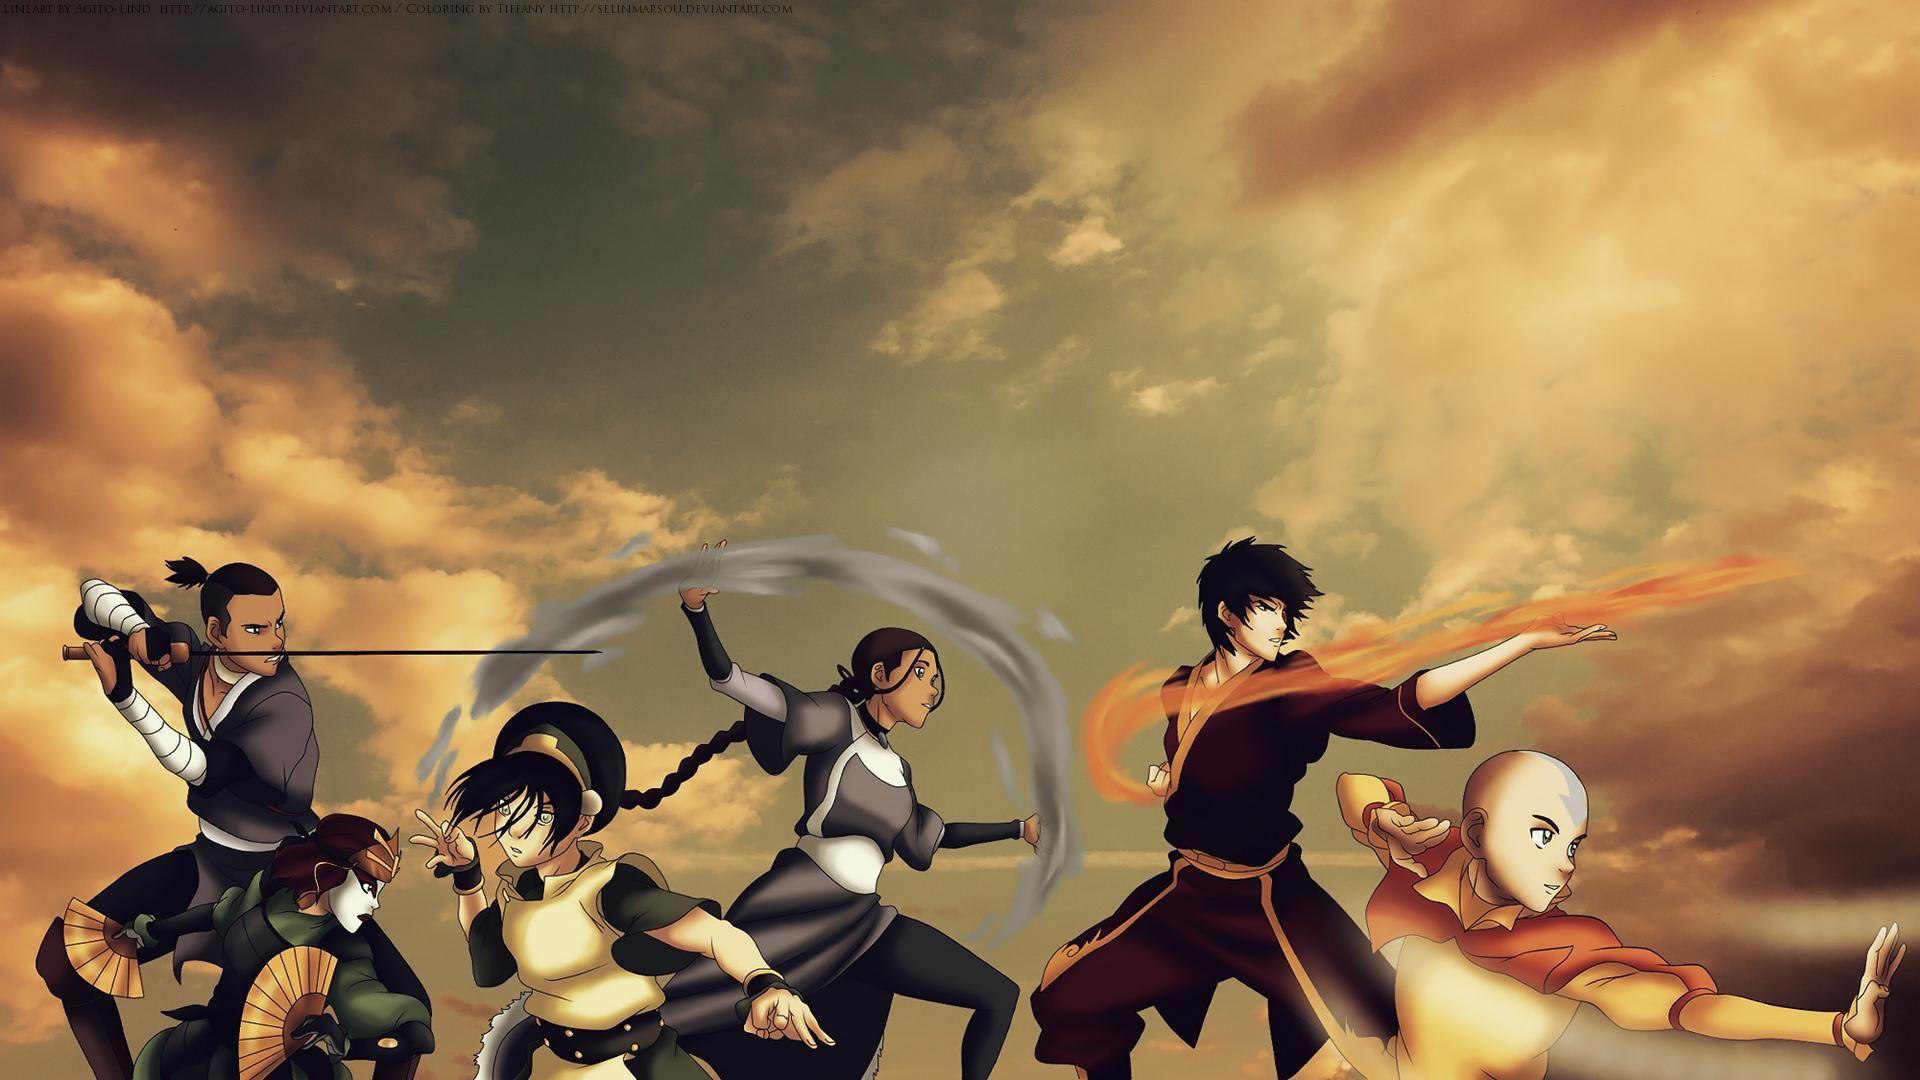 Avatar The Last Airbender Wallpaper Background